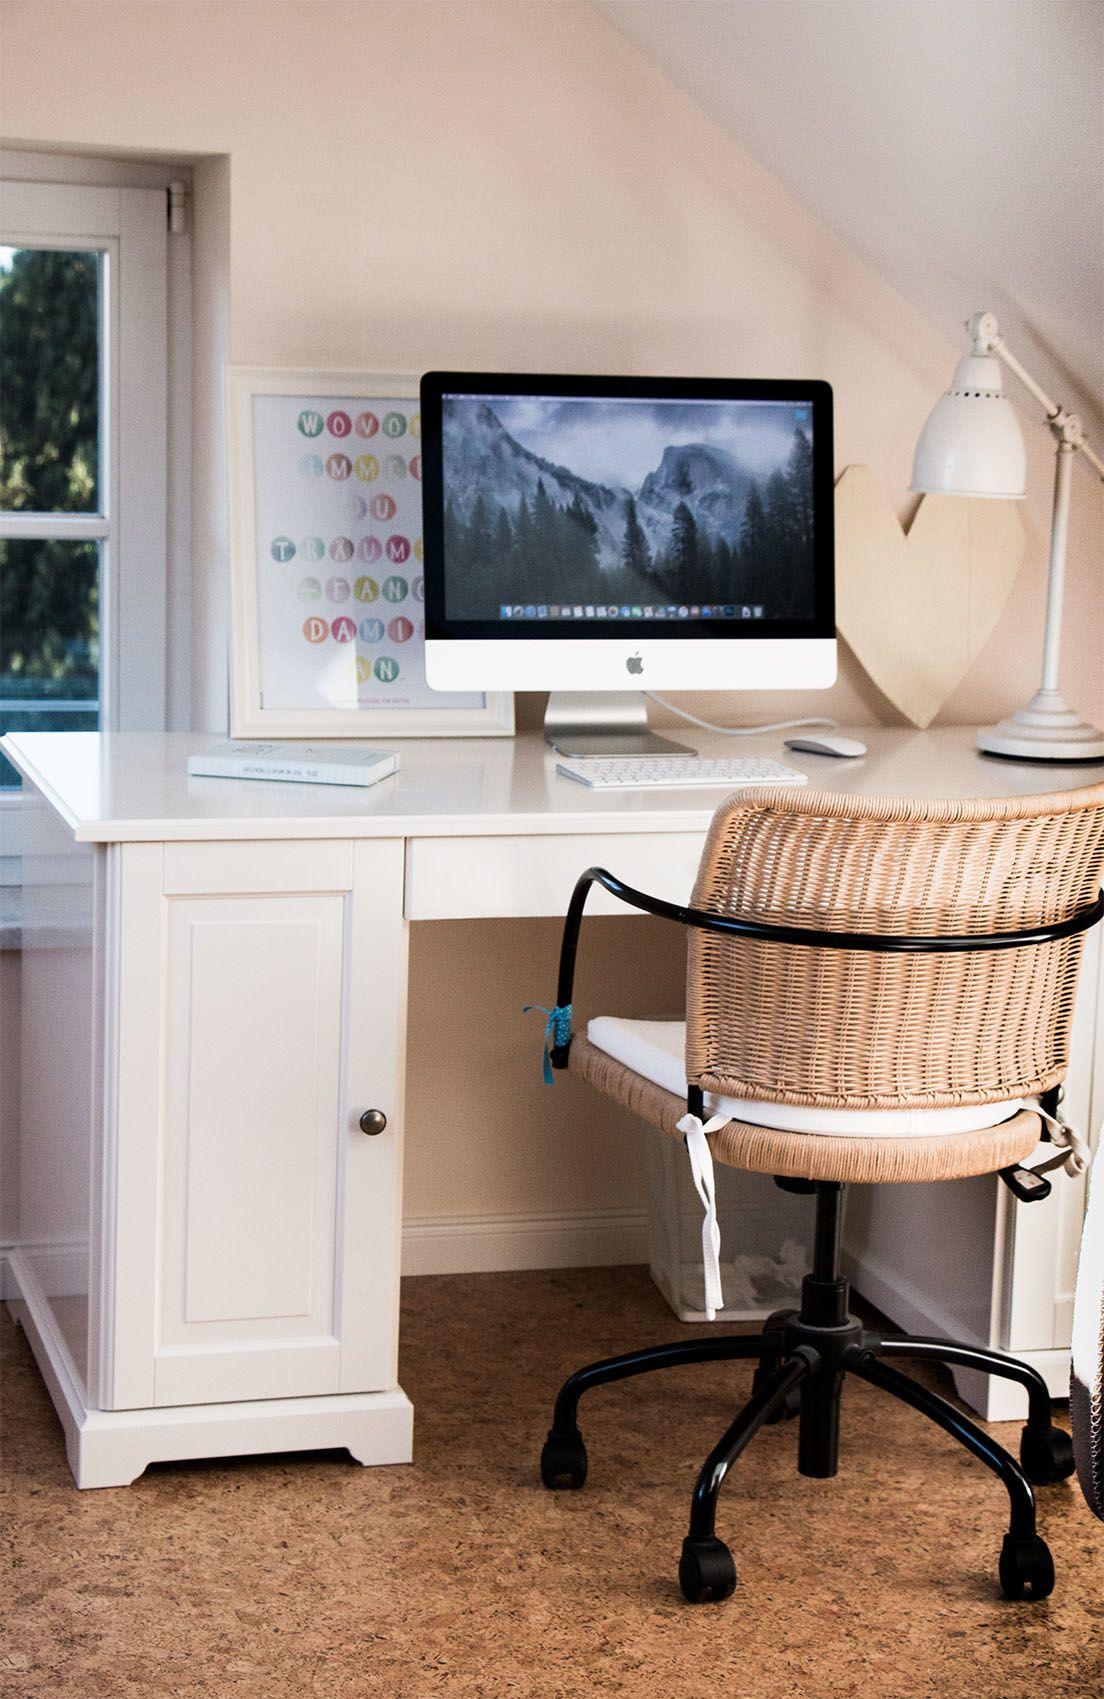 Großartig Ikea Küchenschränke Home Office Ideen - Küchenschrank ...